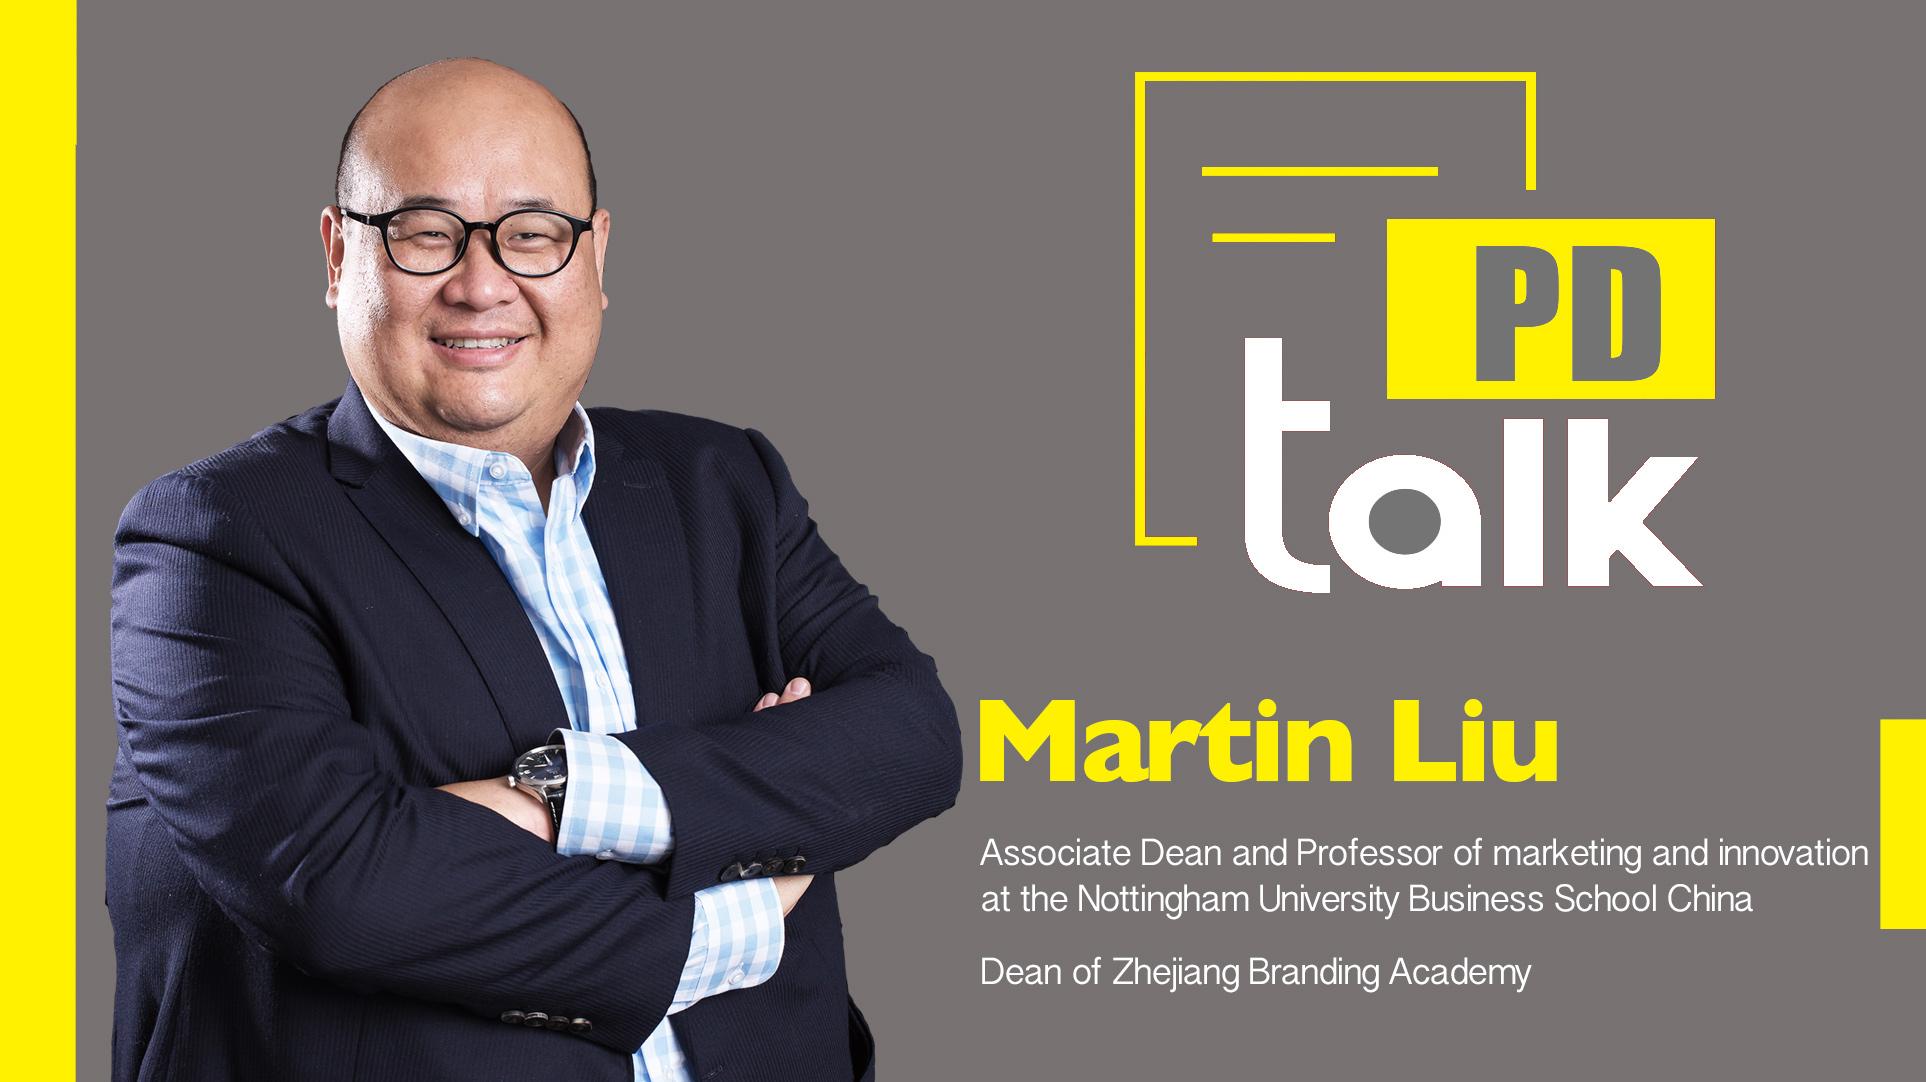 PD Talk | Rebranding China through BRI: Martin Liu